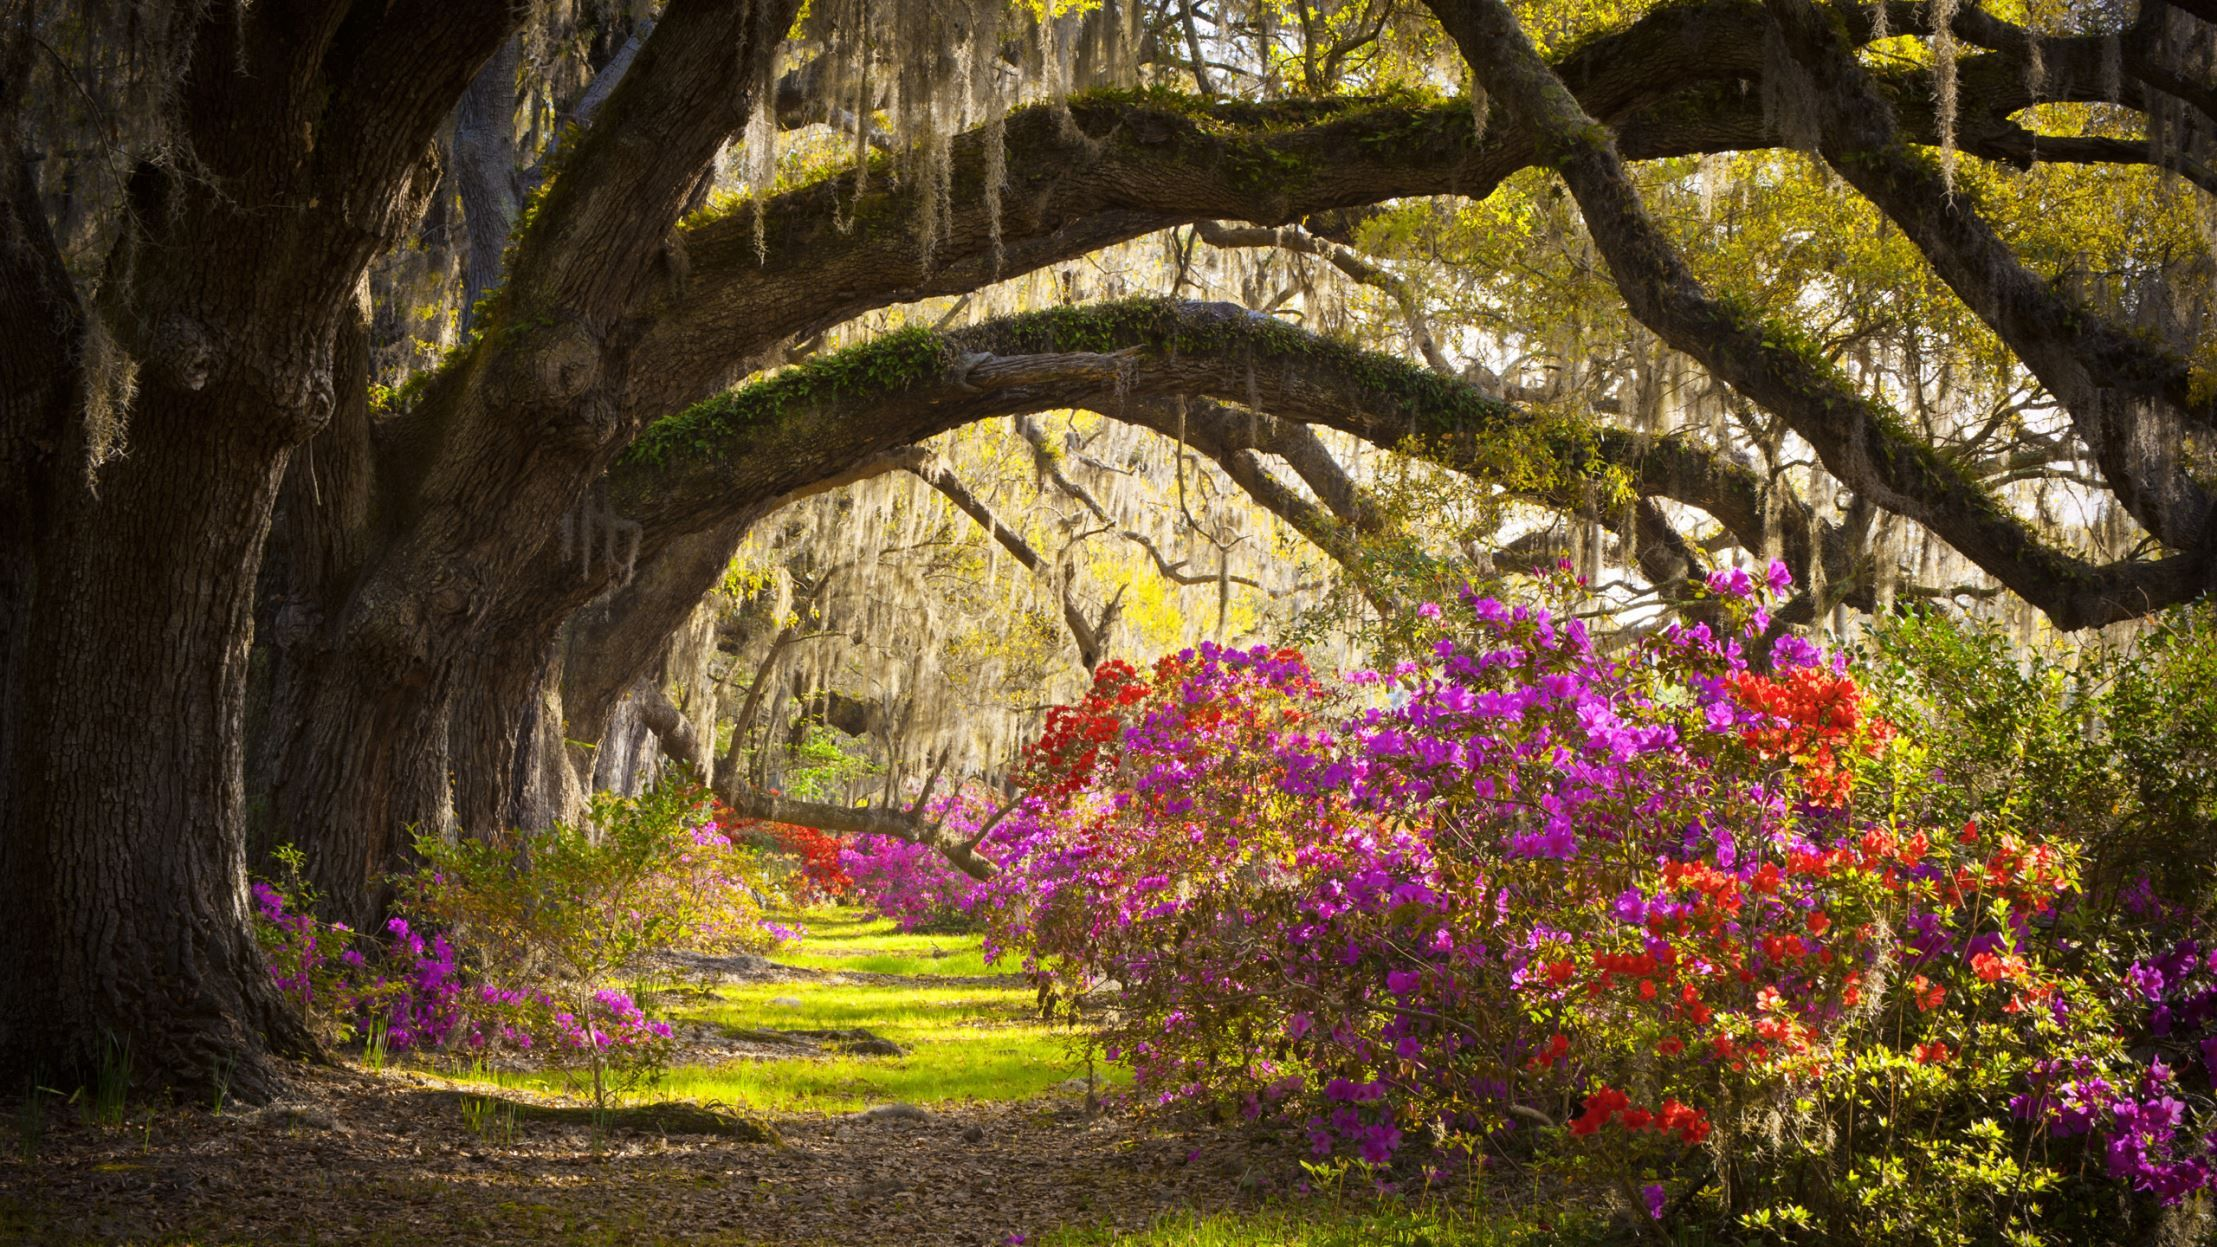 4e2ebfbb0ae4534b7d96c9b22ef57893 - Magnolia Plantation And Gardens Savannah Ga